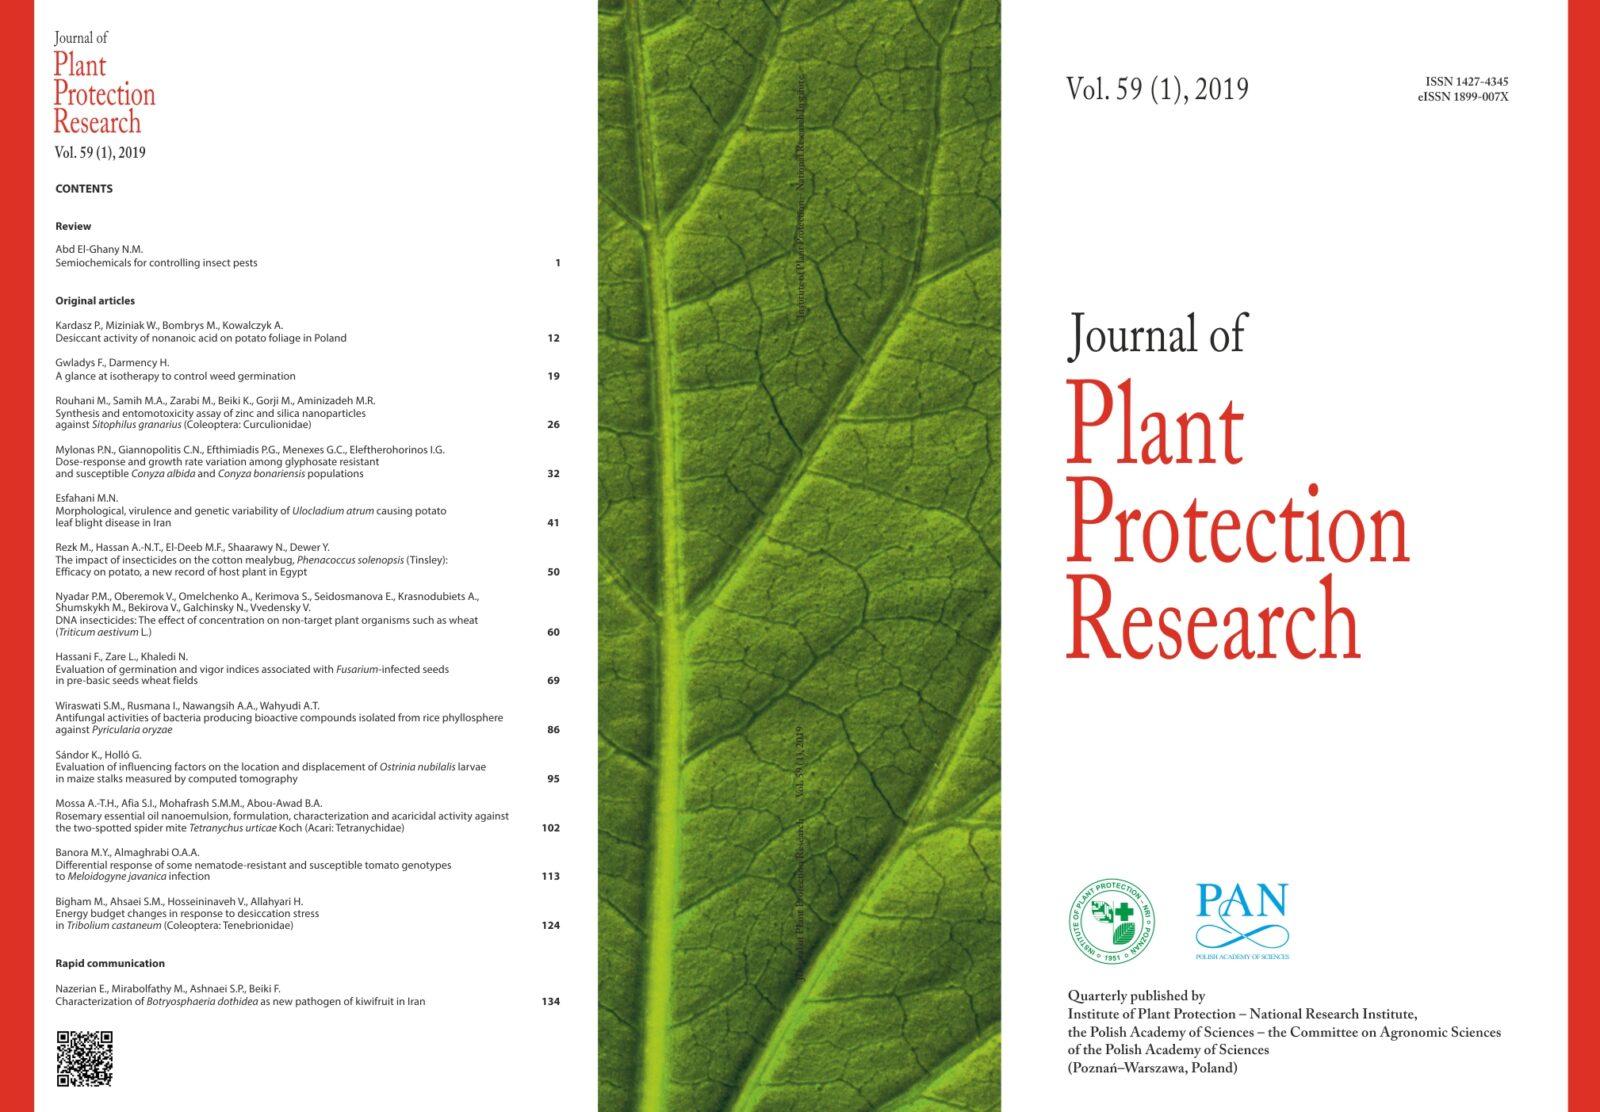 JPPR_cover 59-1-2019